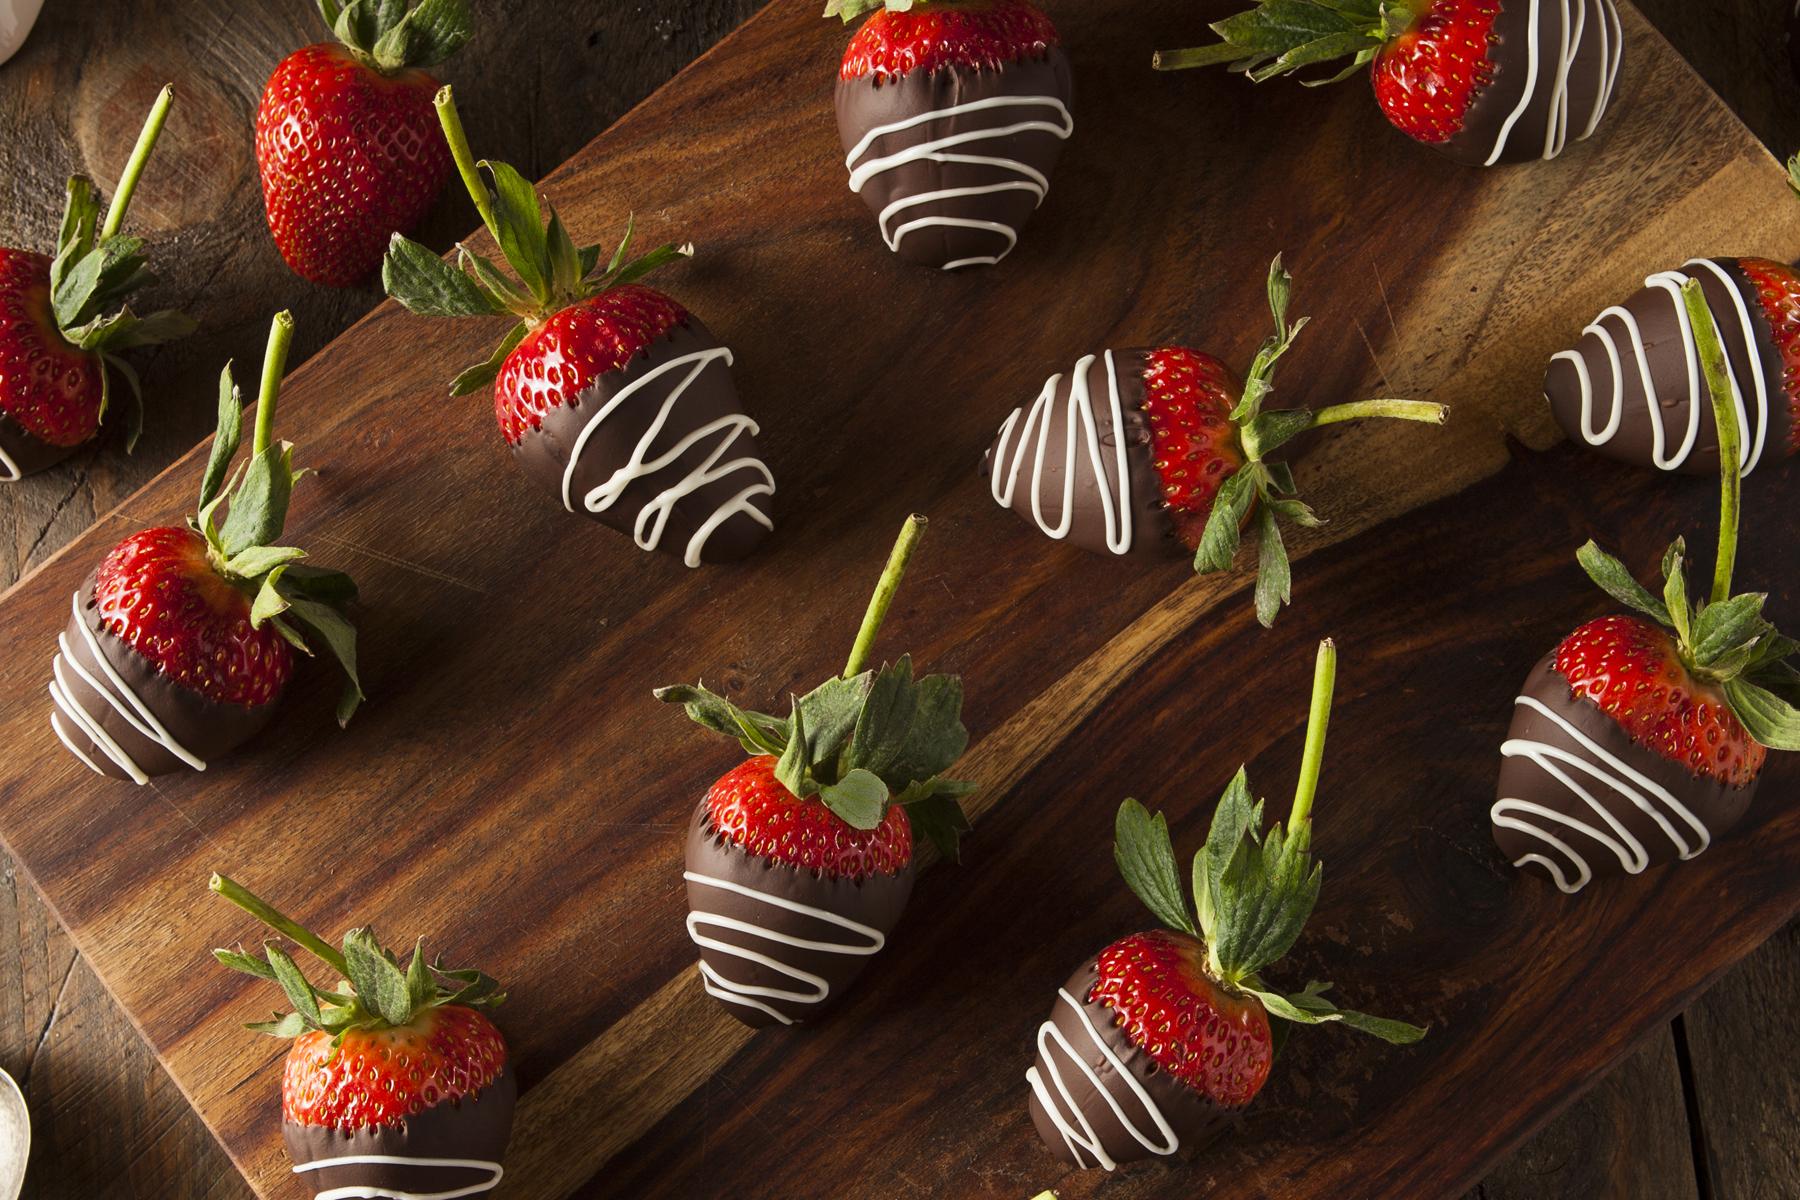 Gringo's Chocolate Dipped Berries